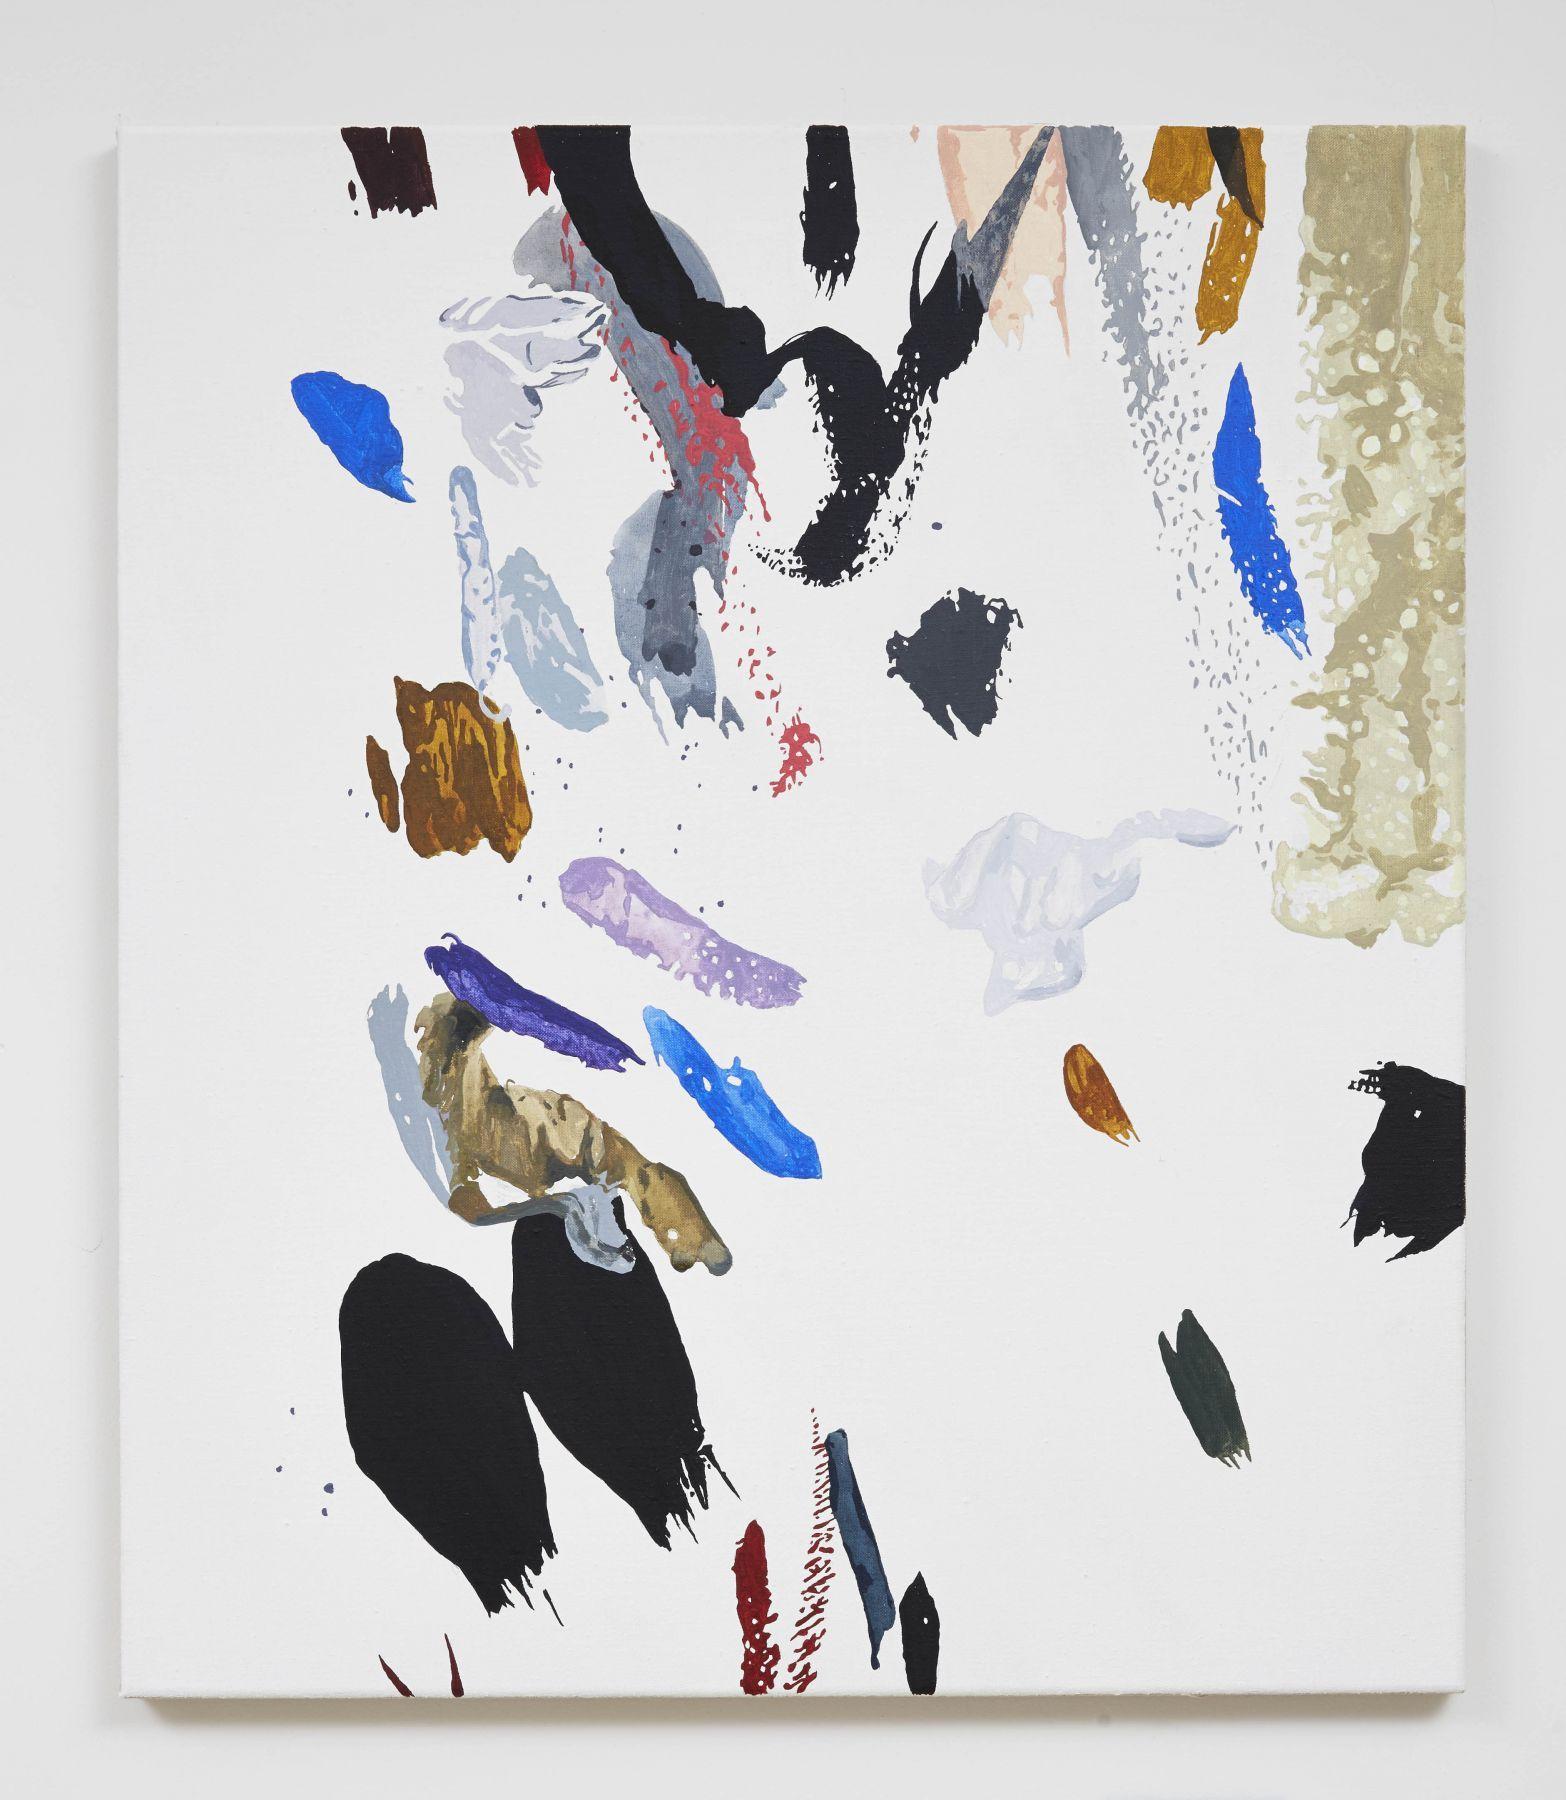 Melissa gordon artists marianne boesky gallery